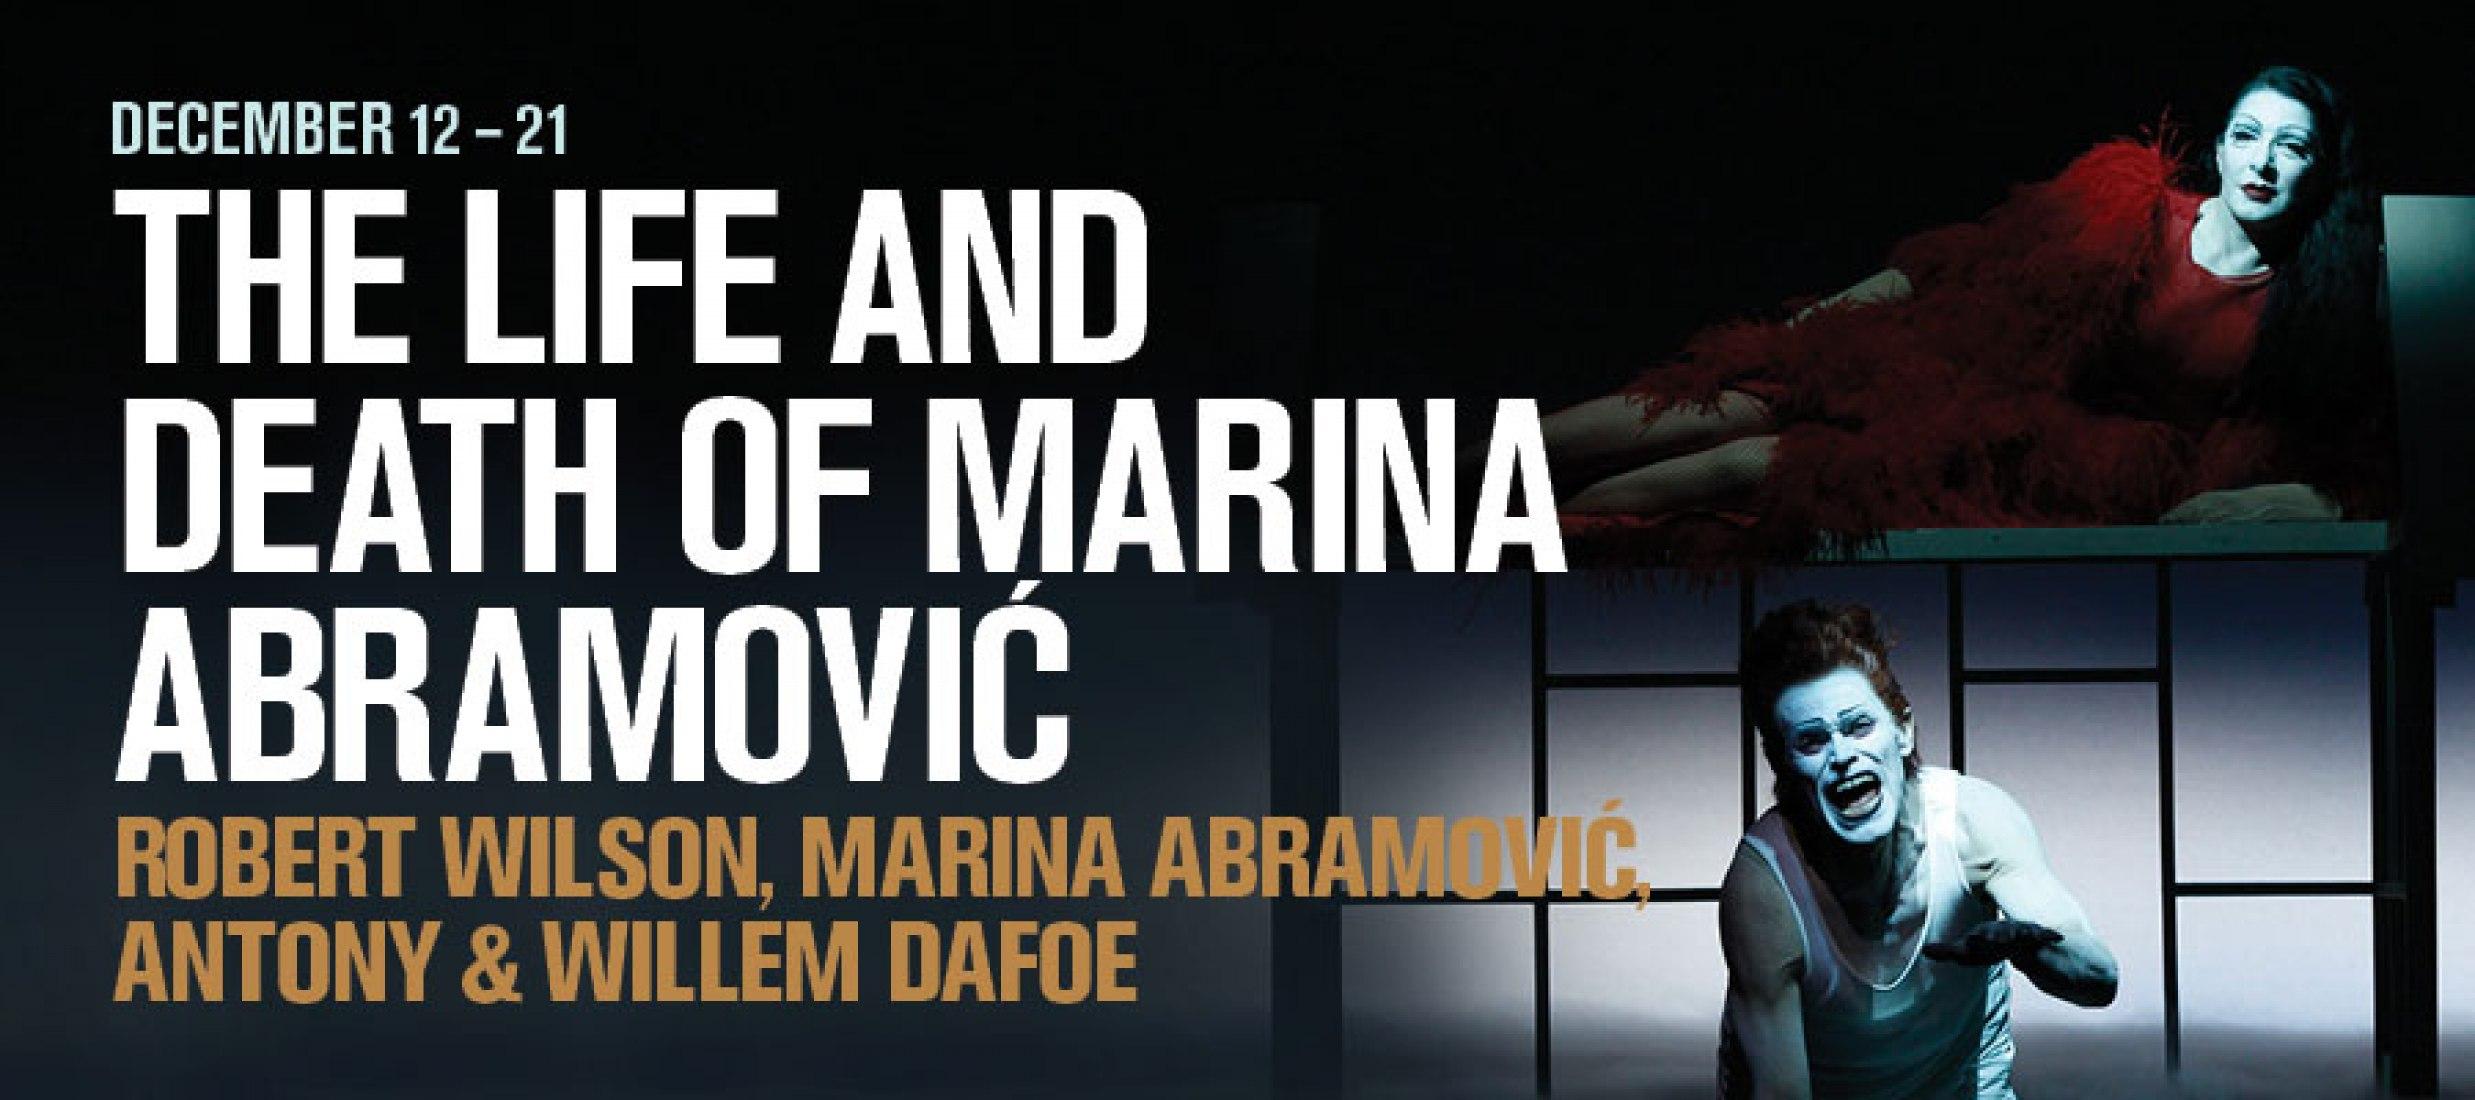 Cartel. The Life and Death of Marina Abramović. Imagen cortesía de Luminato Festival.  Fotografía © Lucie Jansch.